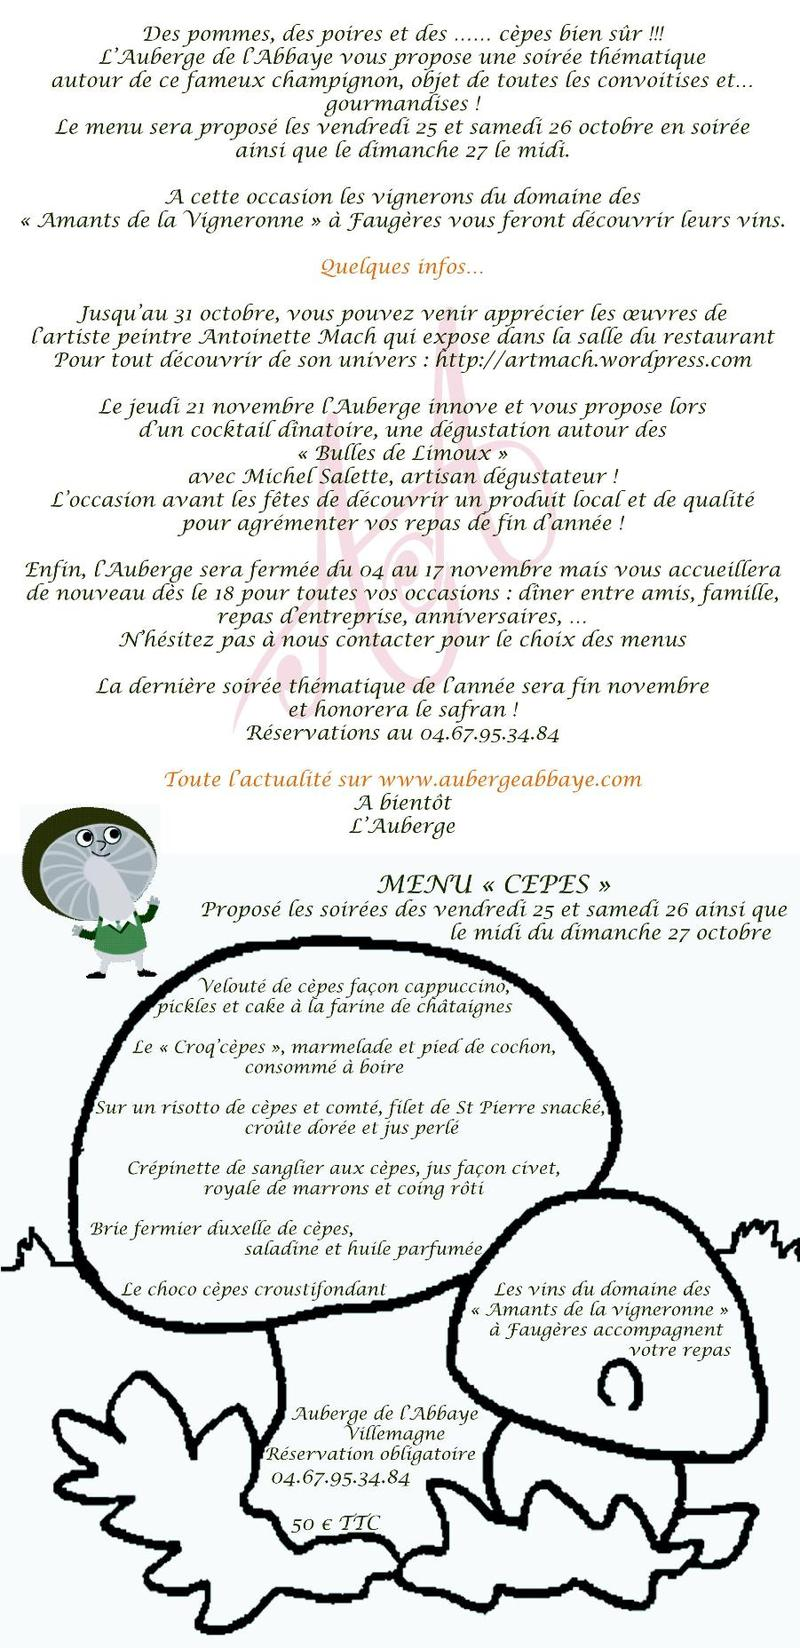 Auberge de l'Abbaye - newsletter octobre